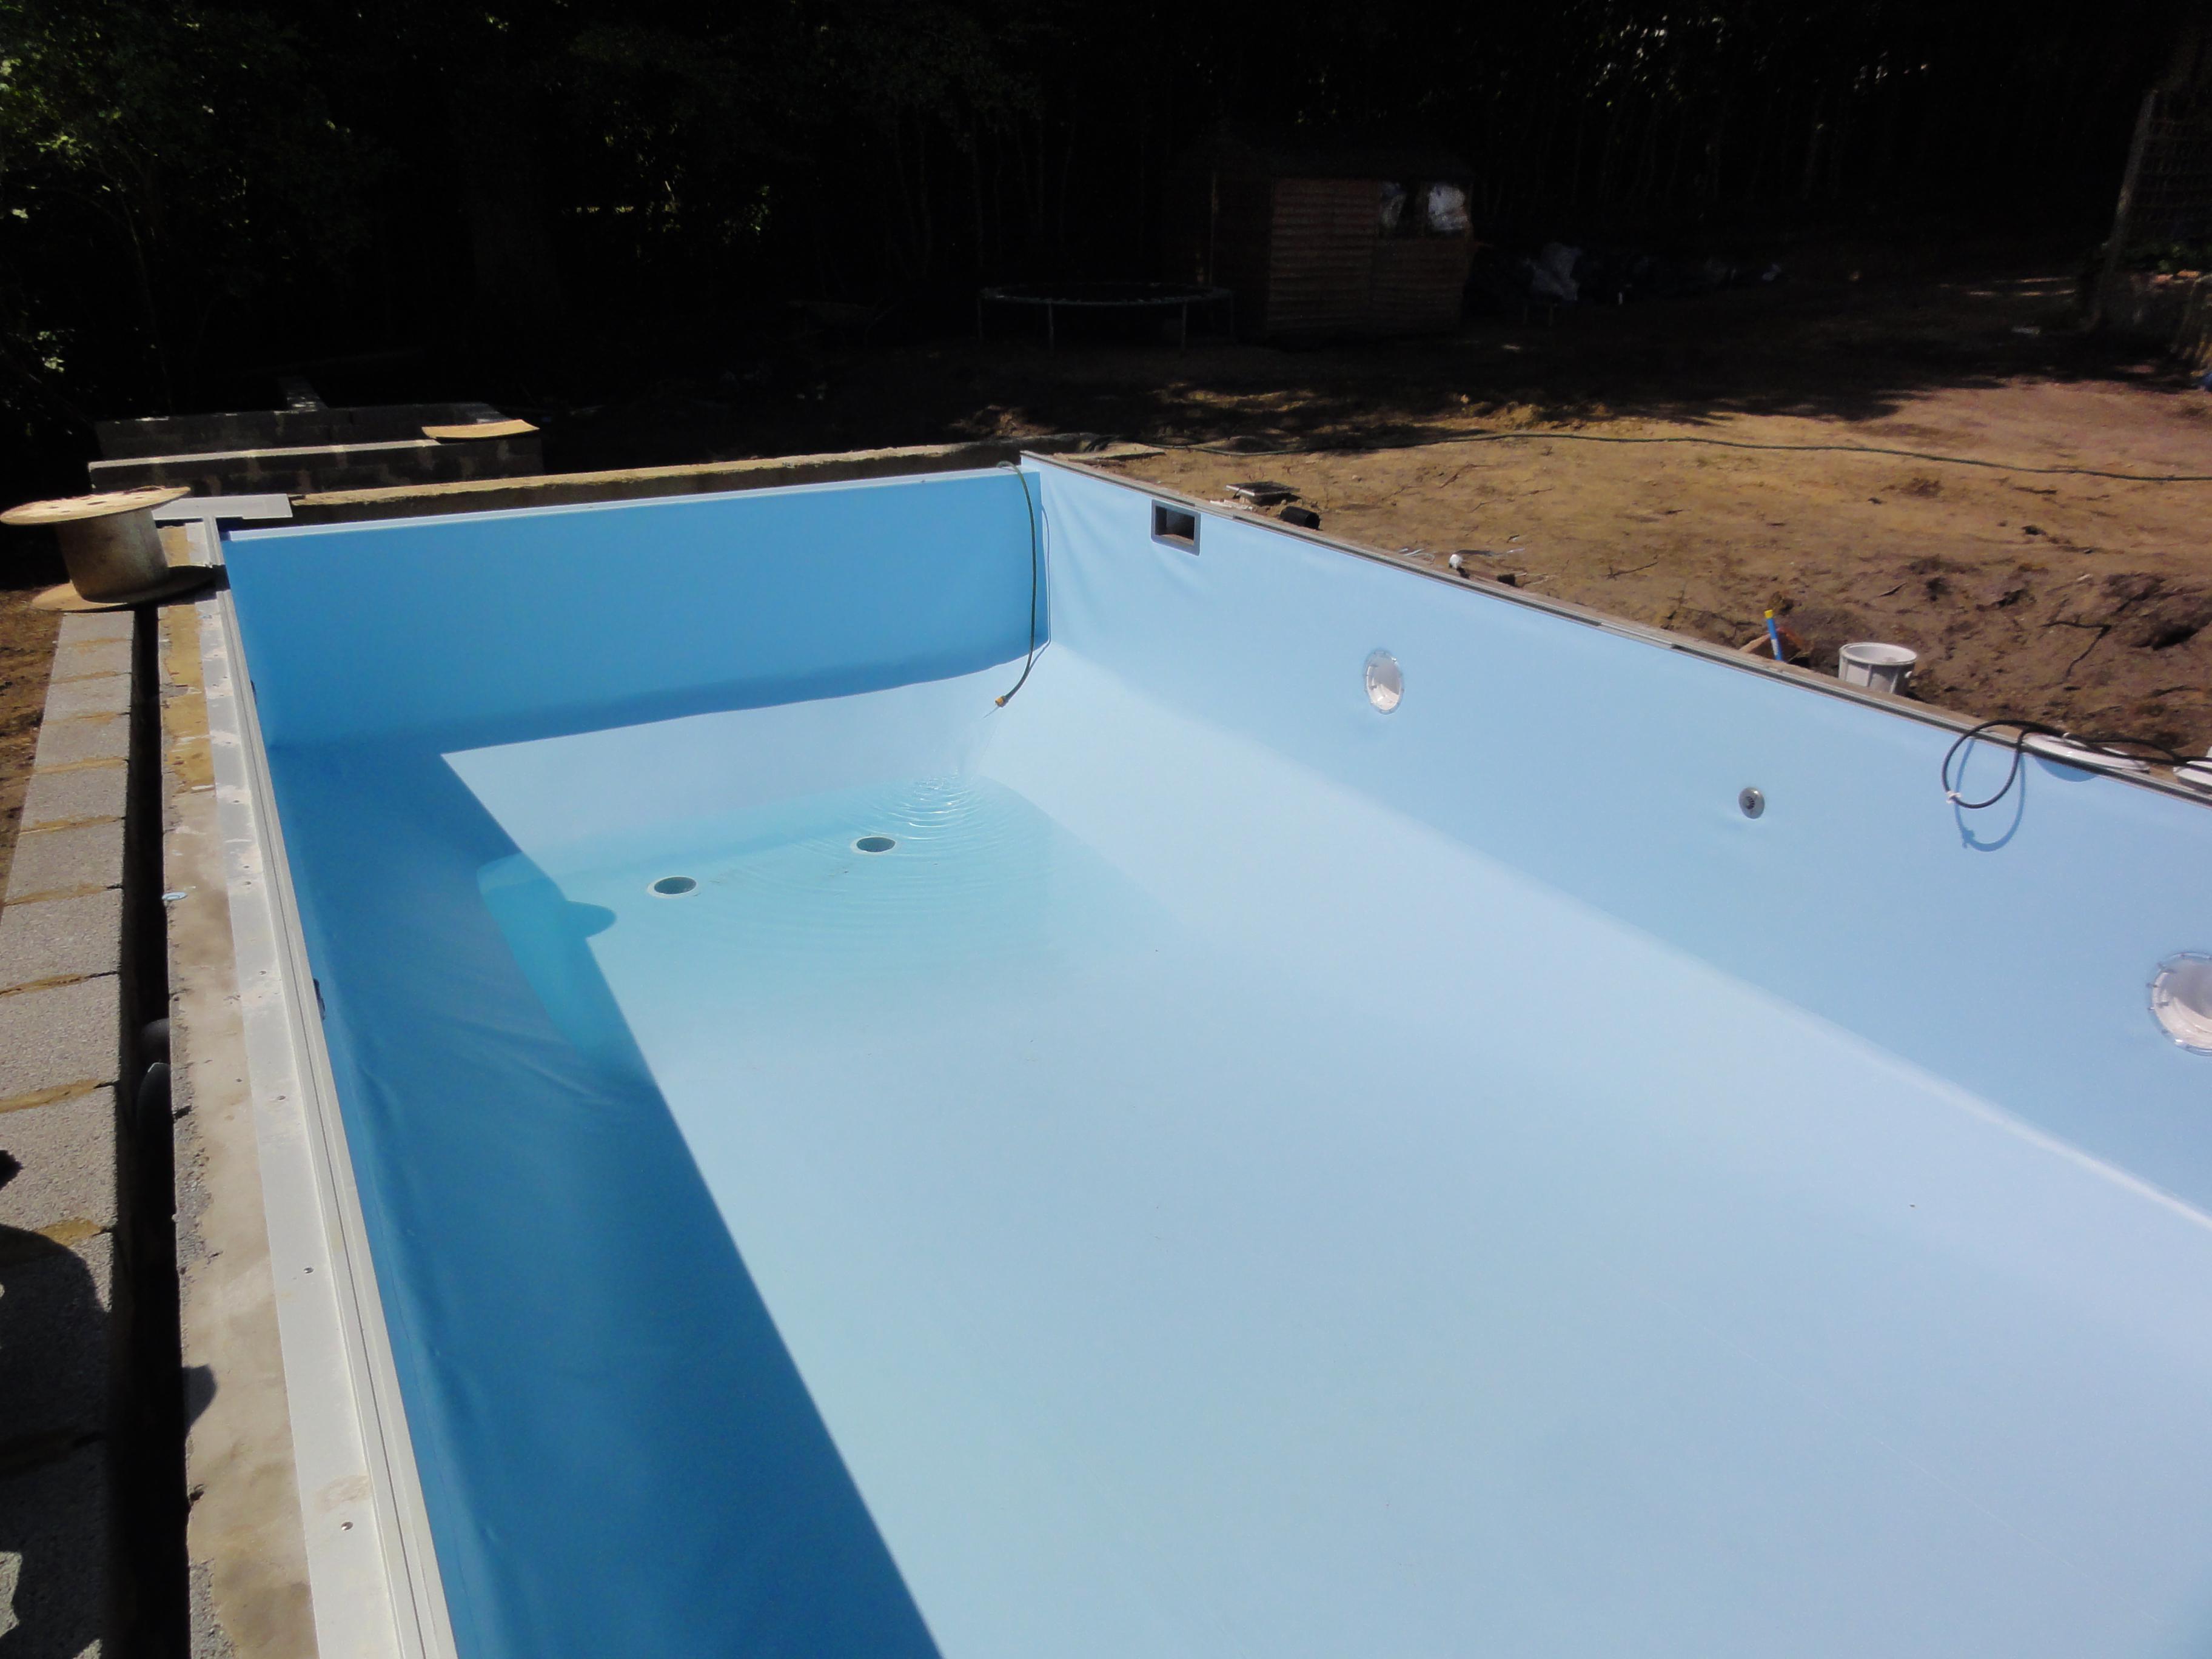 pool liner installation ascot pools swimming pool construction berkshire surrey. Black Bedroom Furniture Sets. Home Design Ideas